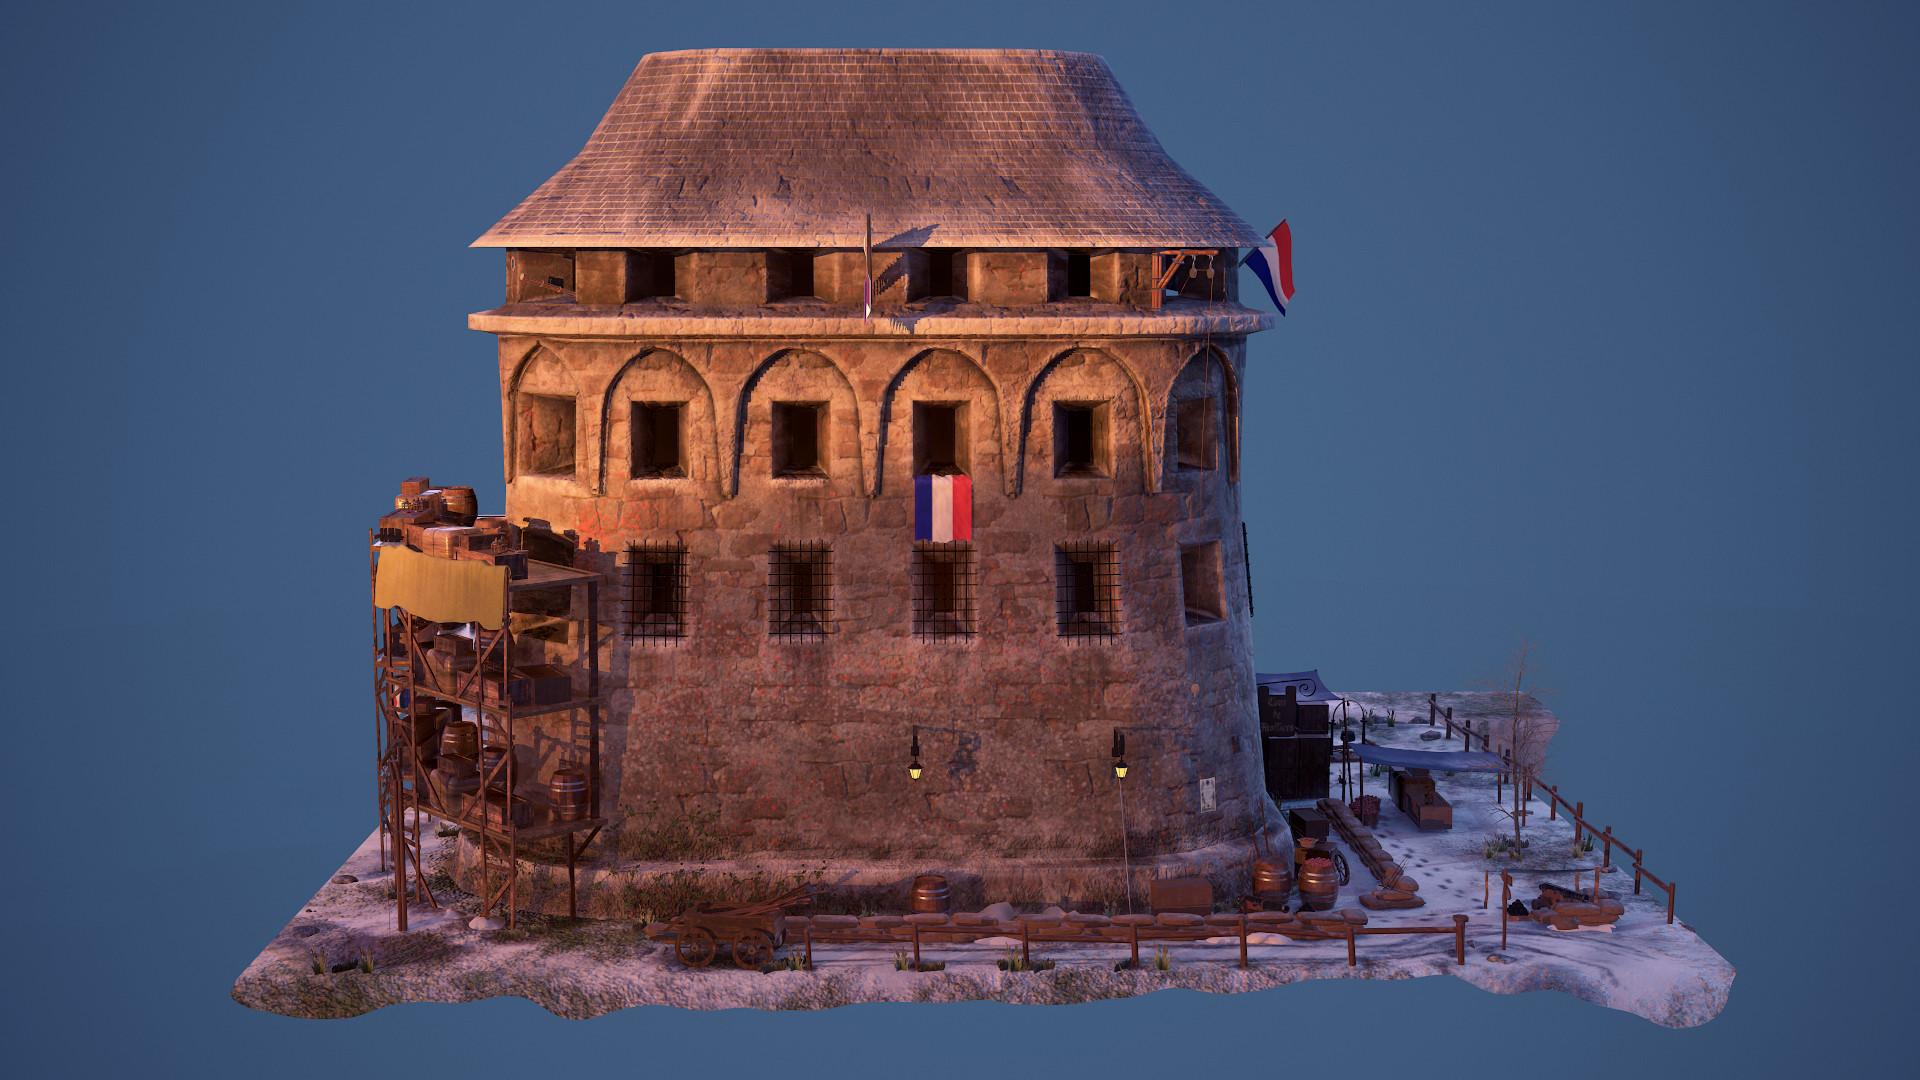 Dani palacio santolaria screenshot026